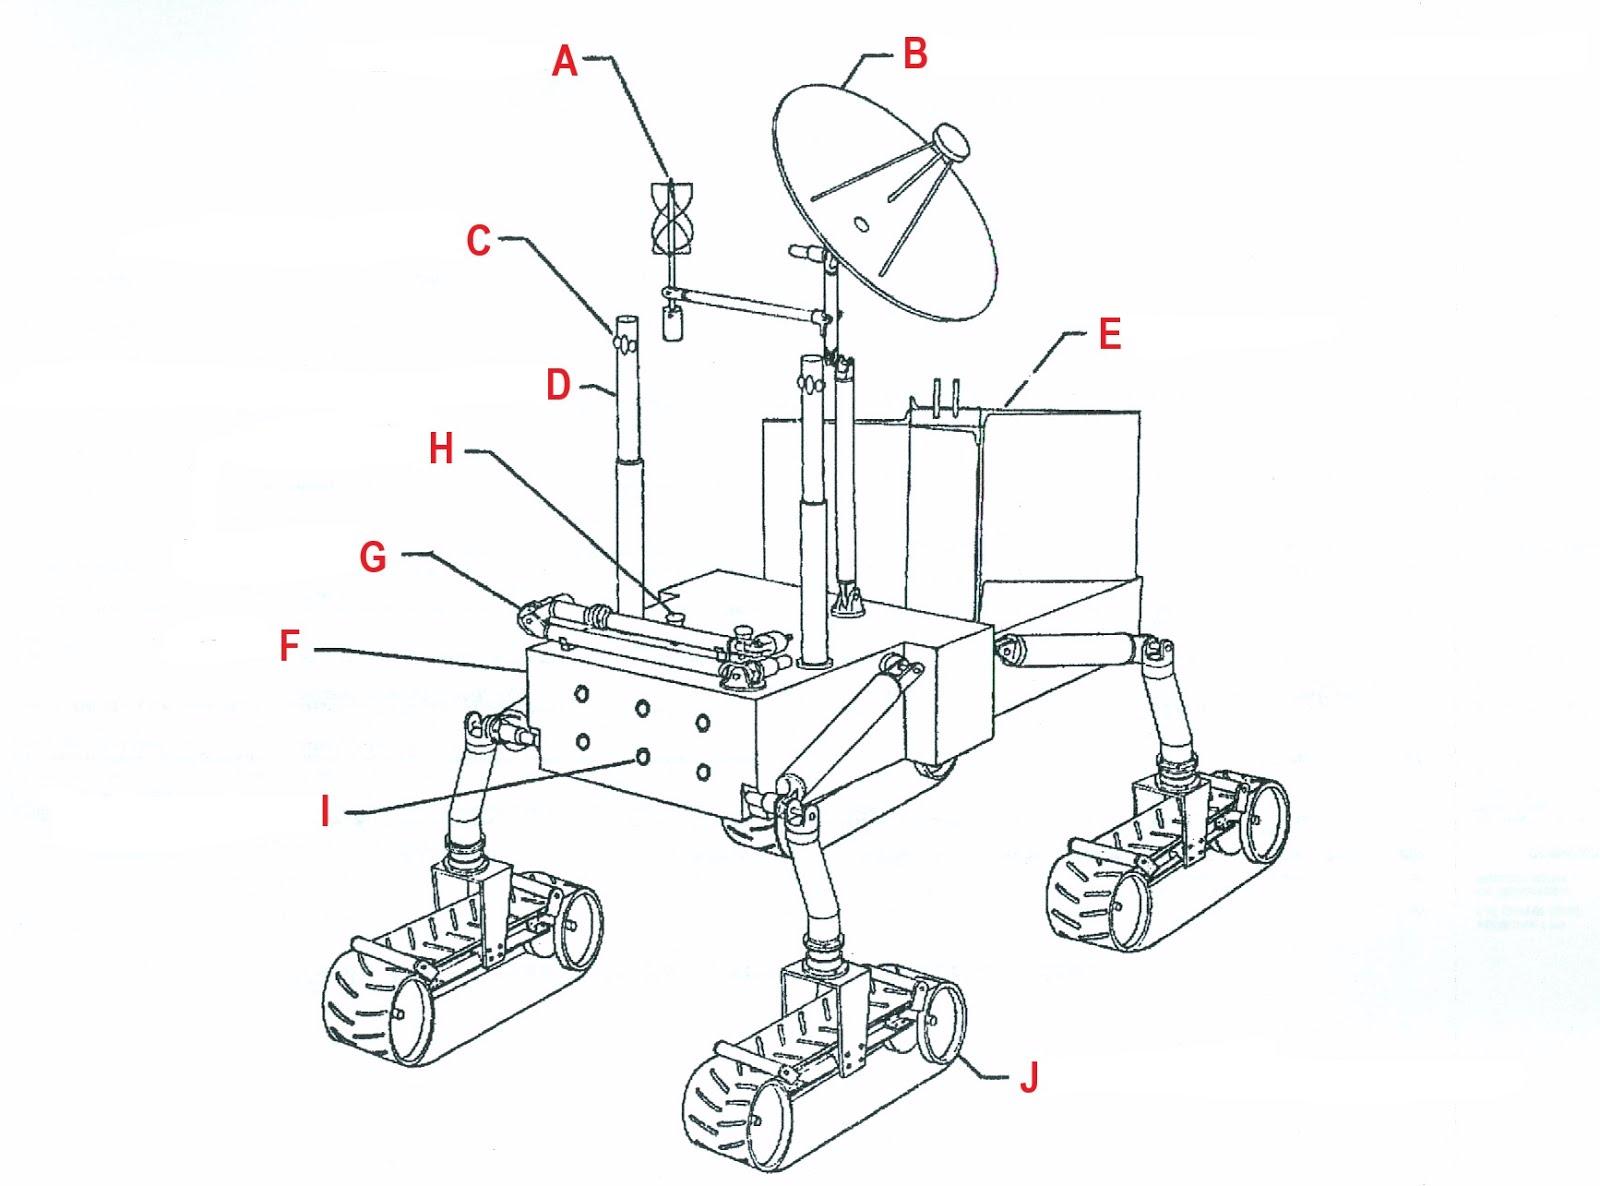 Dsfp S Spaceflight History Space Station Gemini